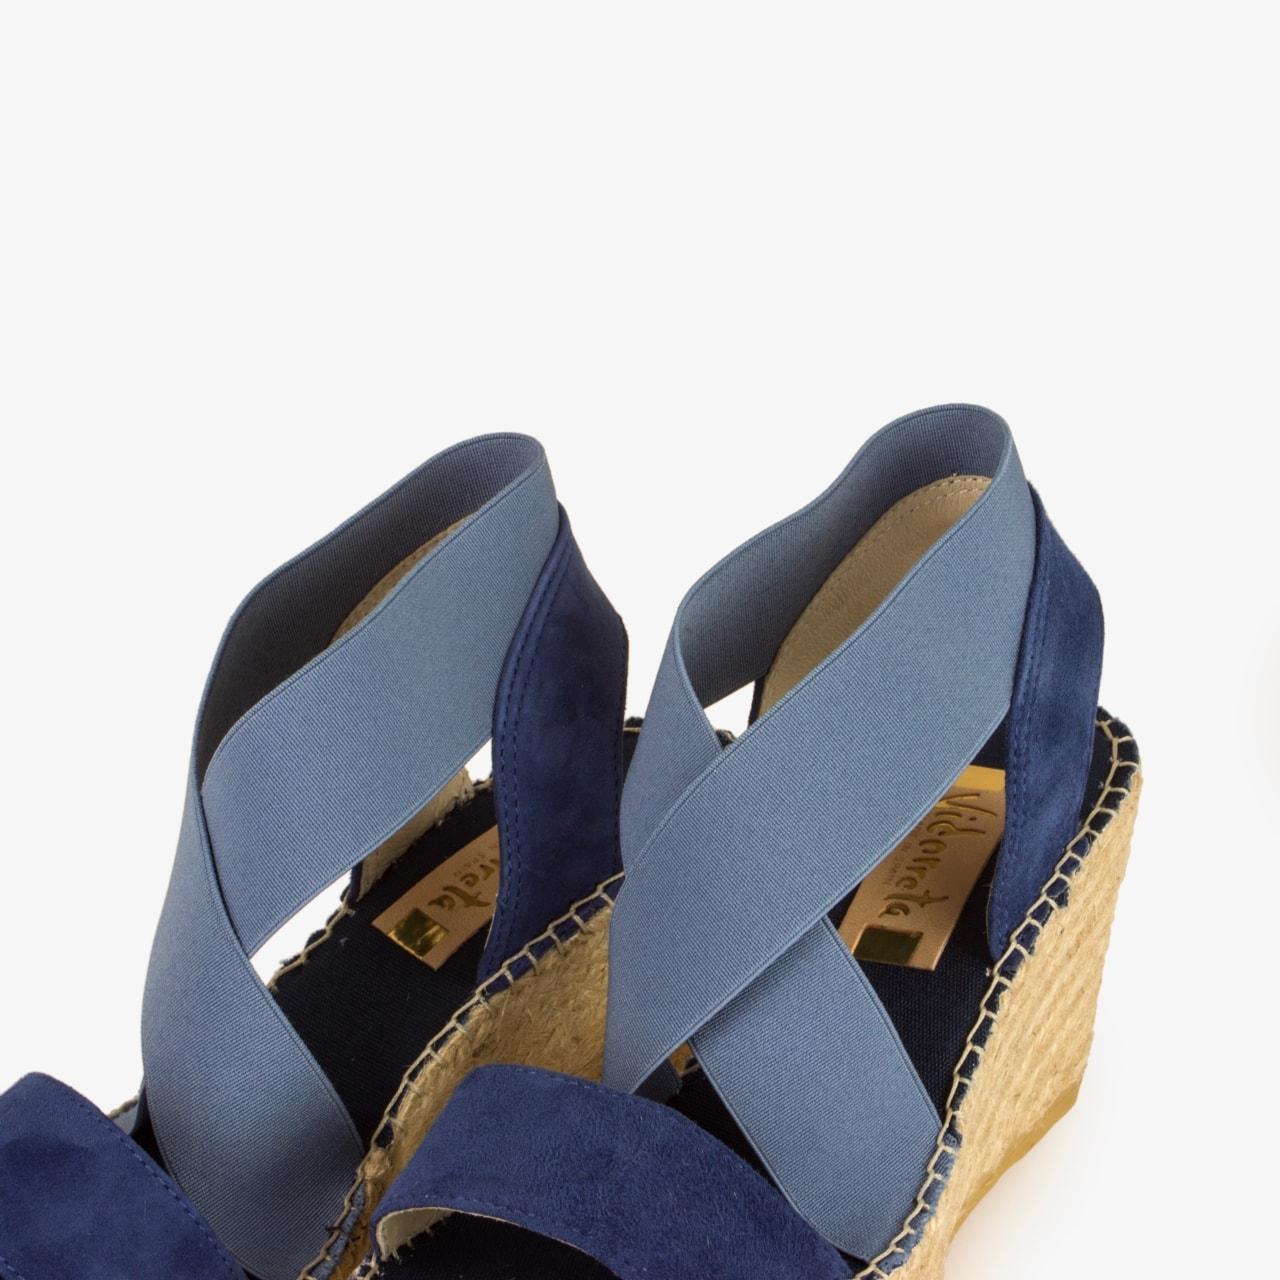 Sandalia Cuña Yute Azul - Ítem2